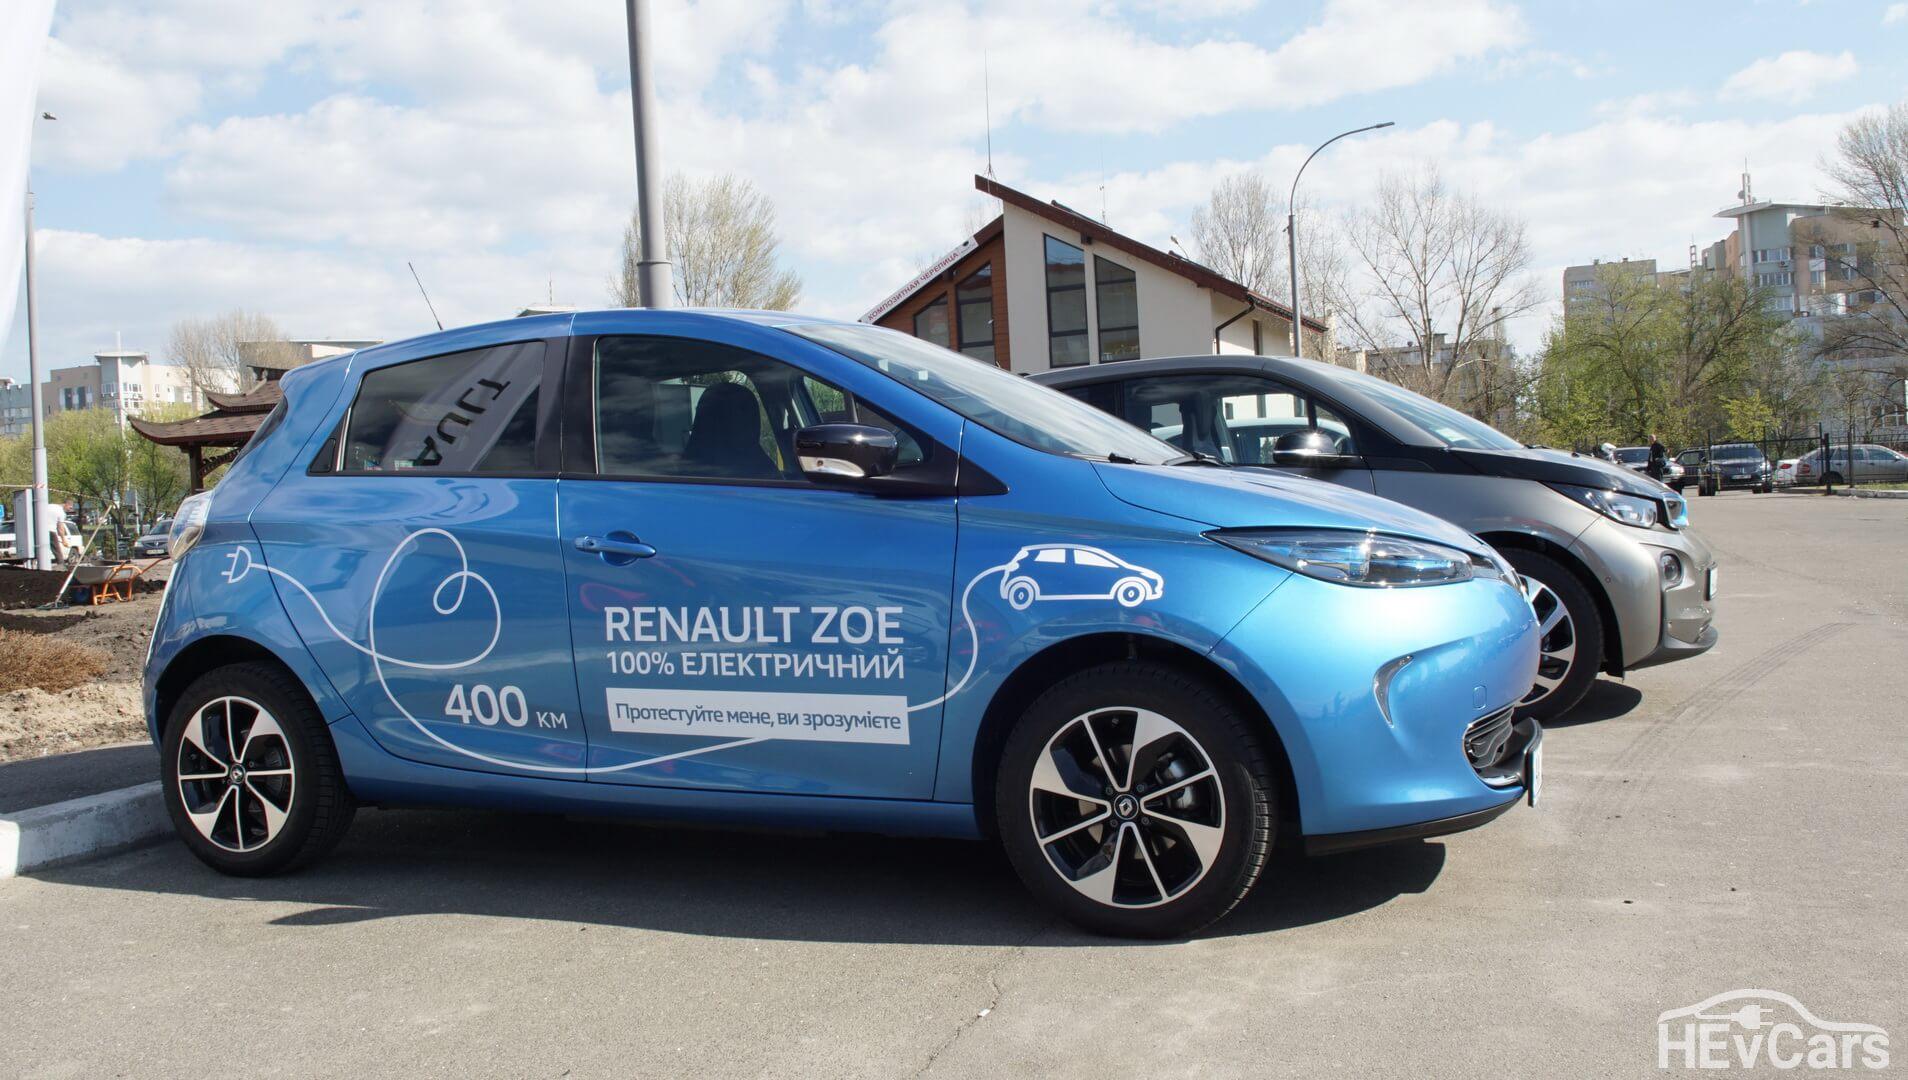 Renault анонсировала новую версию ZOE с запасом хода 400 км (по NEDC)